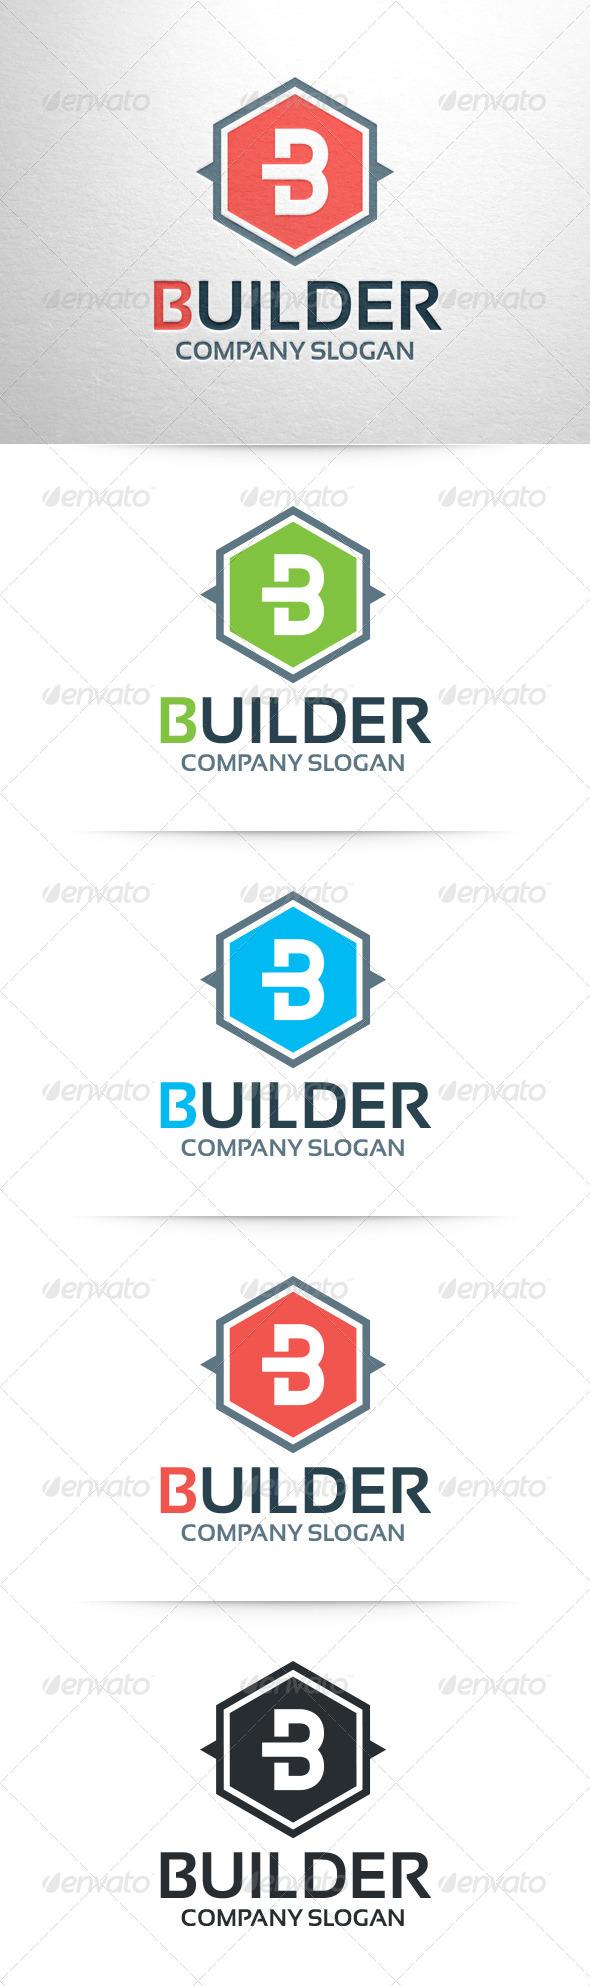 GraphicRiver Builder Letter B Logo 6795170